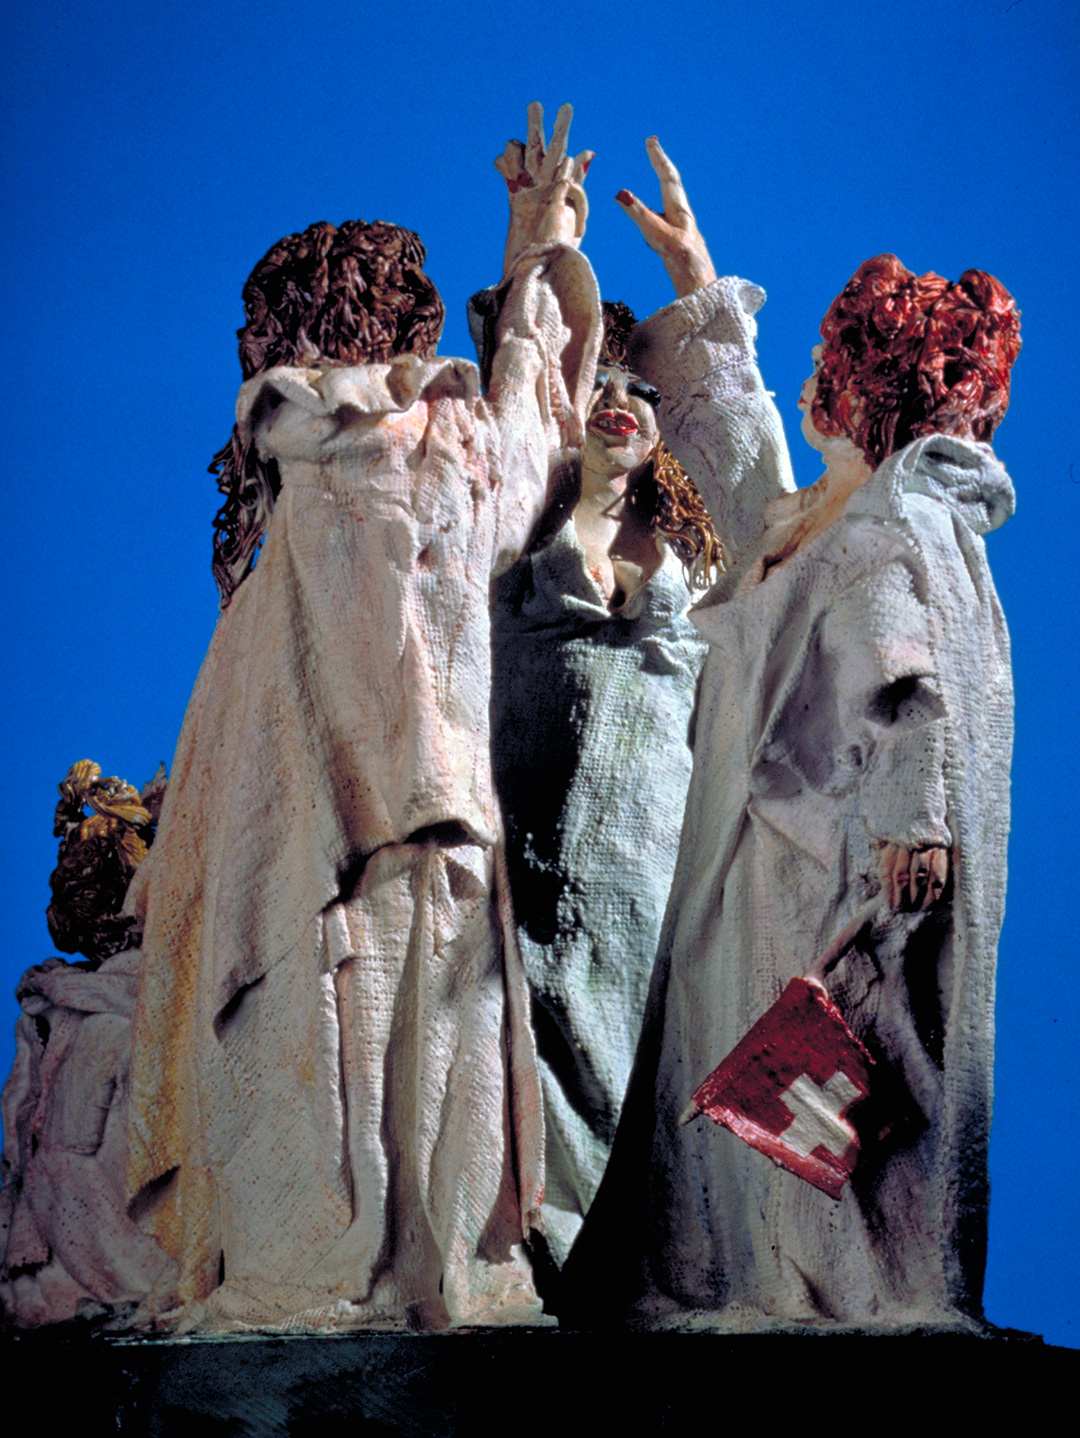 Serment du Grütli actualisé: trois femmes prêtant serment avec une fillette. Rütlischwur. Margot Güttinger, Yverdon. 1991. 34,5 x 21,5 x 32 cm. Gips bemalt.